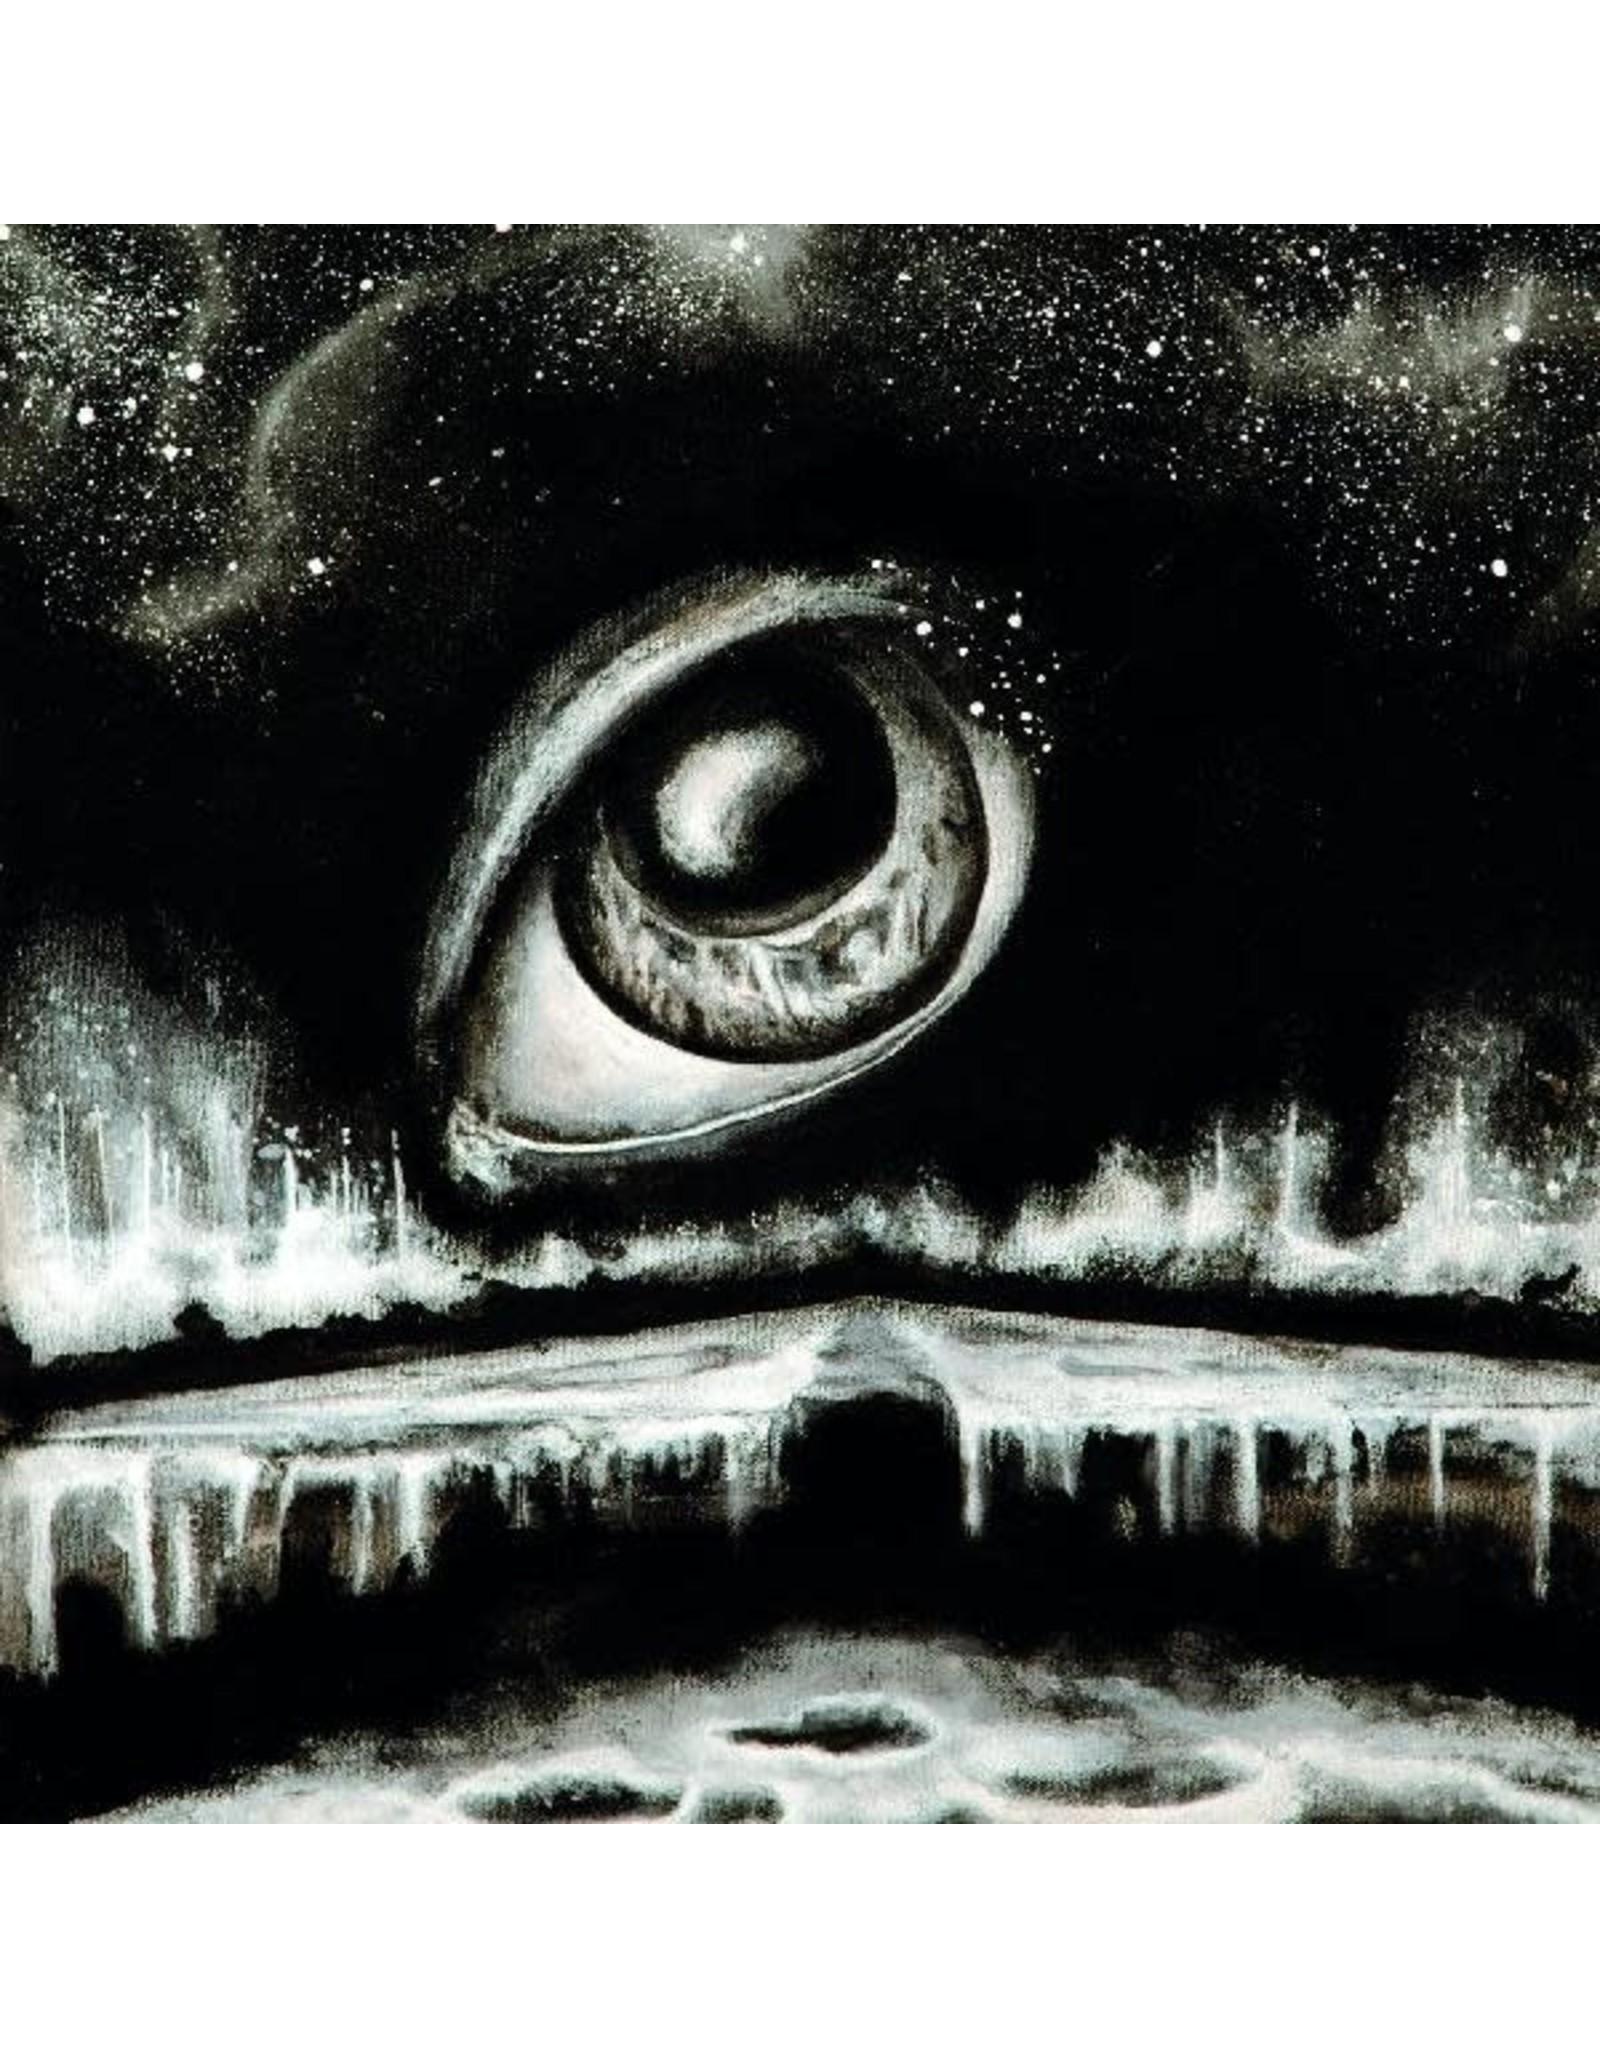 New Vinyl UFO Over Lappland - S/T (Colored) LP